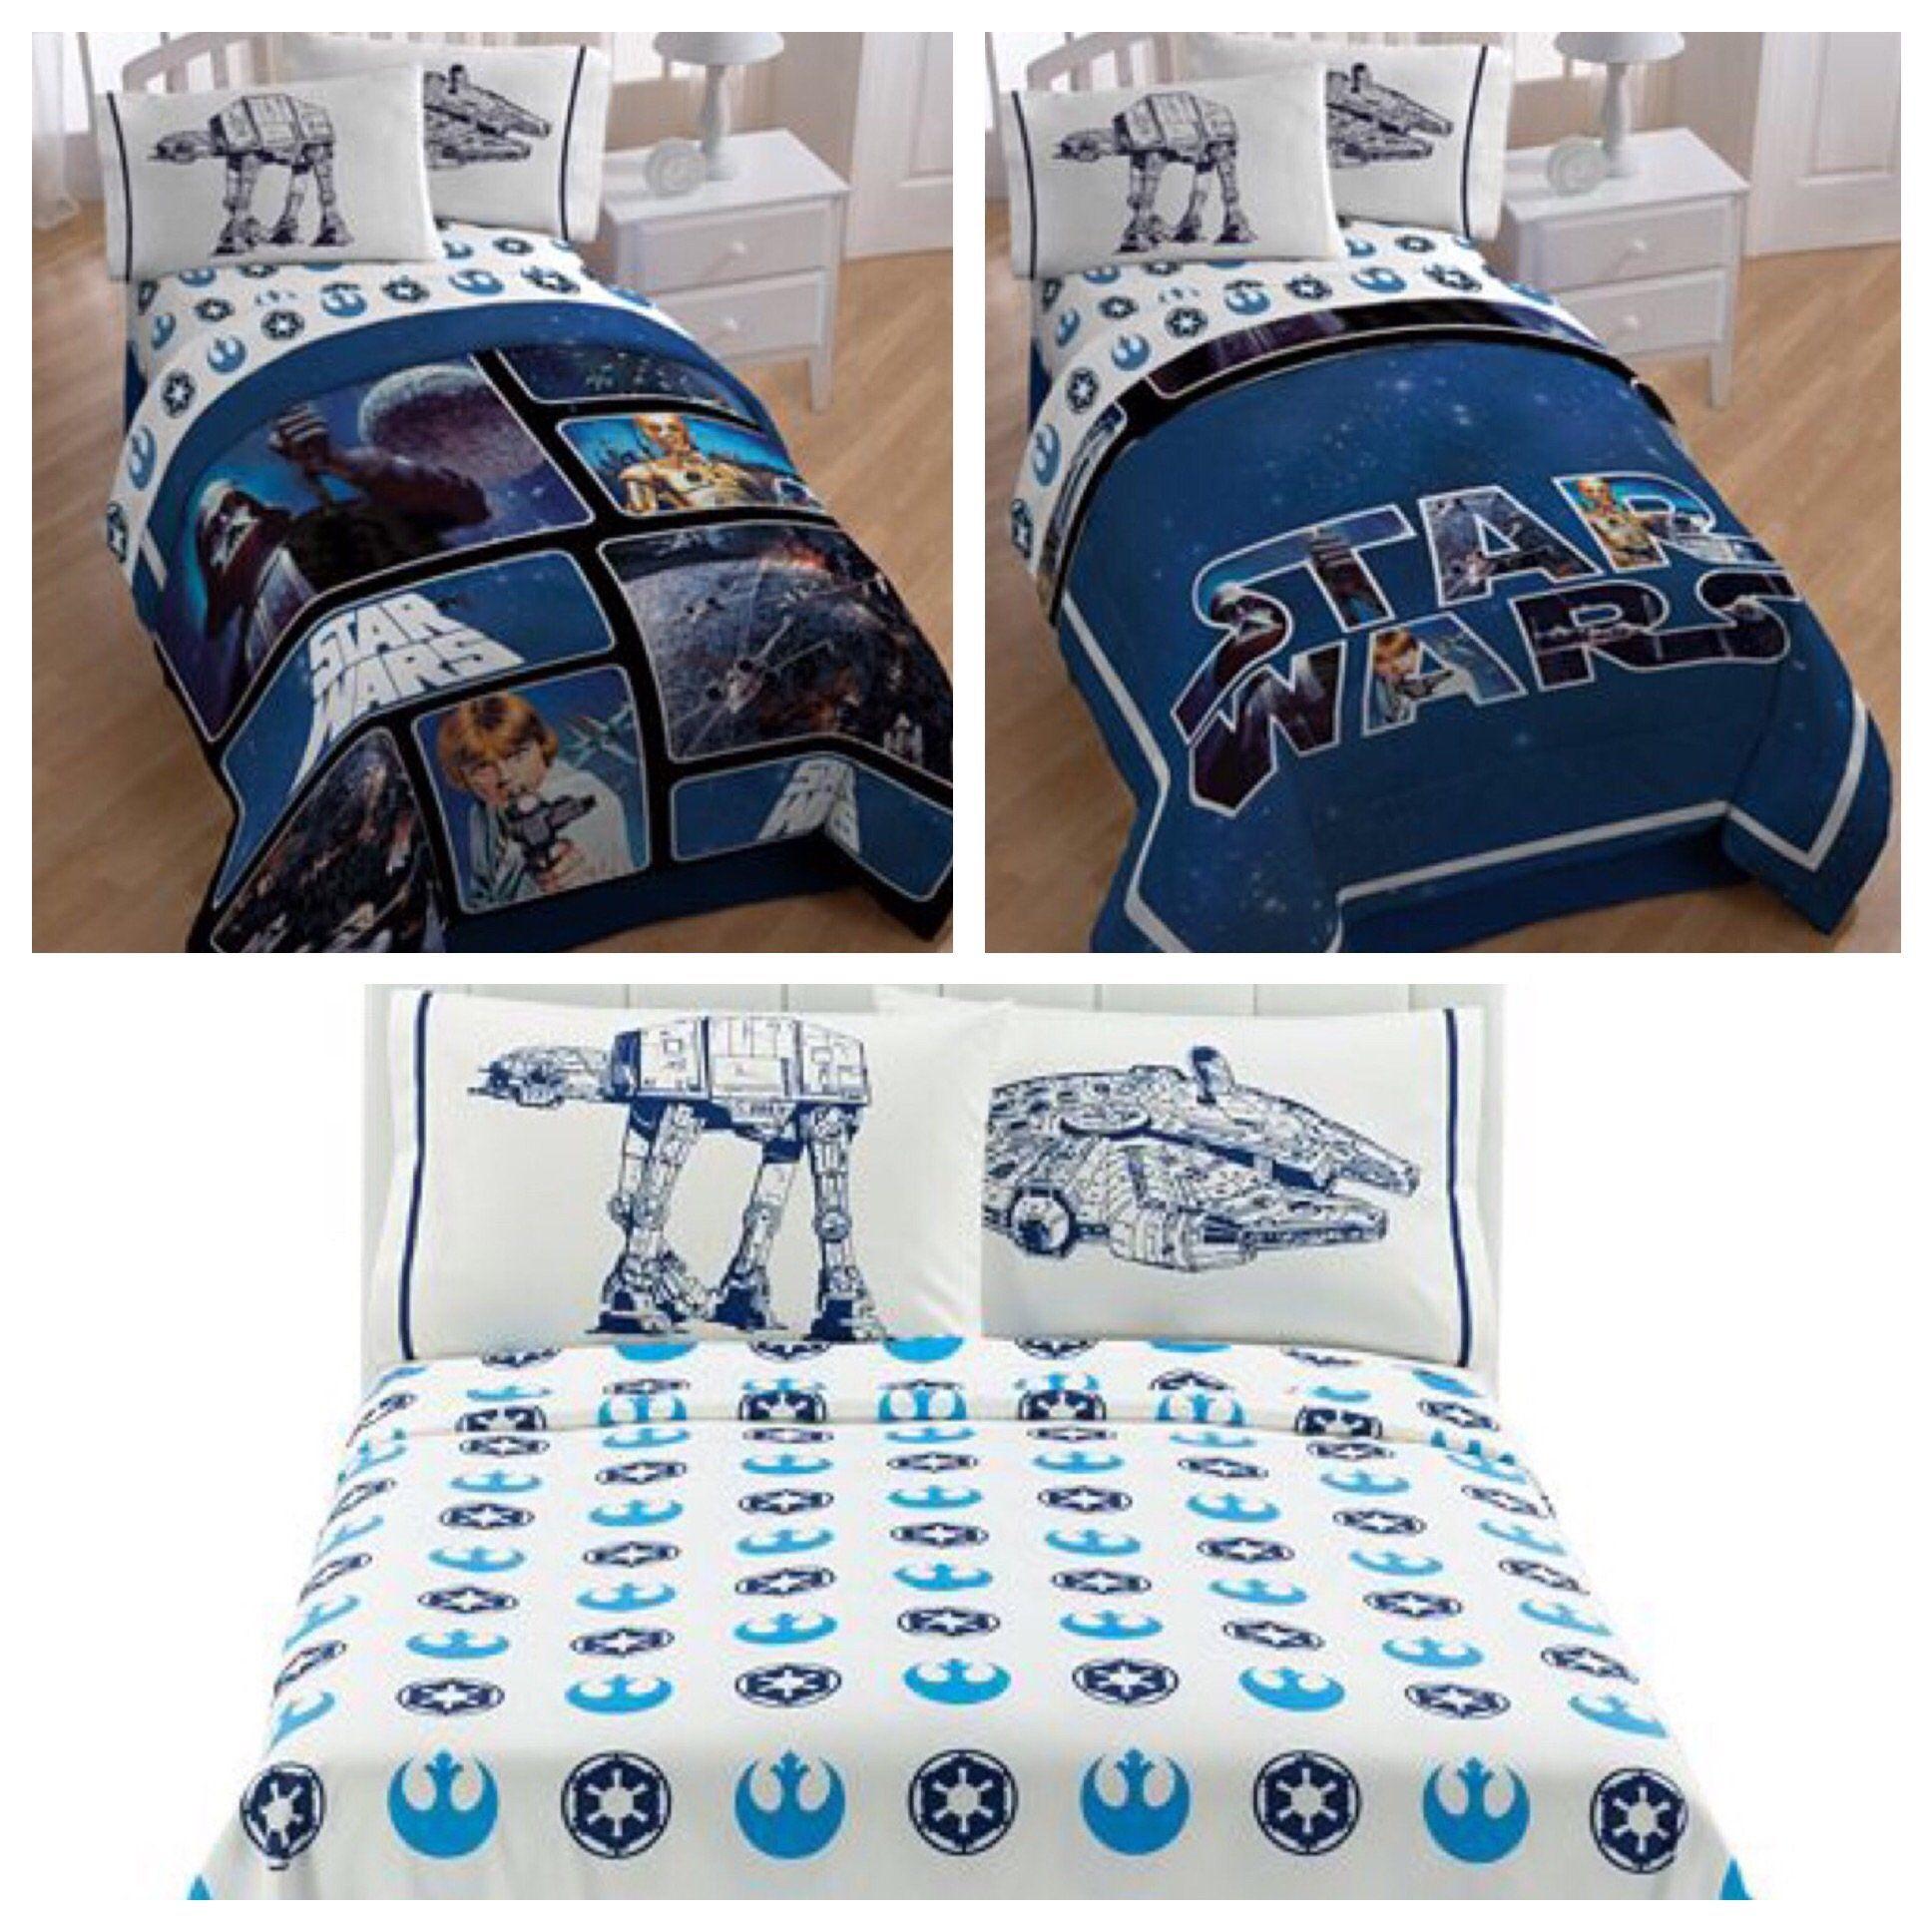 Star Wars Saga Classic Reversible Full Size Bedding Set Full